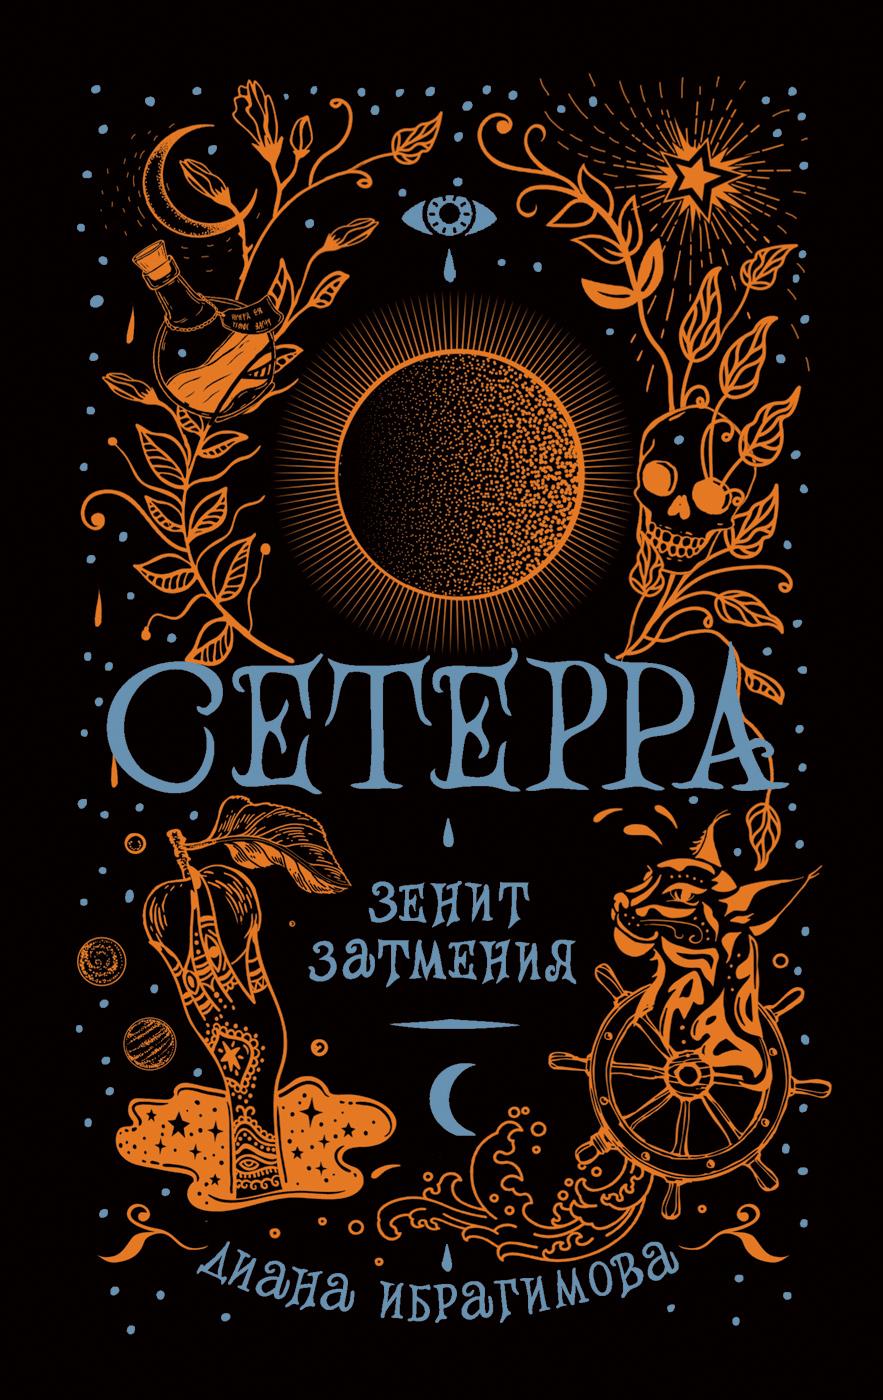 Ибрагимова Д. Сетерра. 3. Зенит затмения